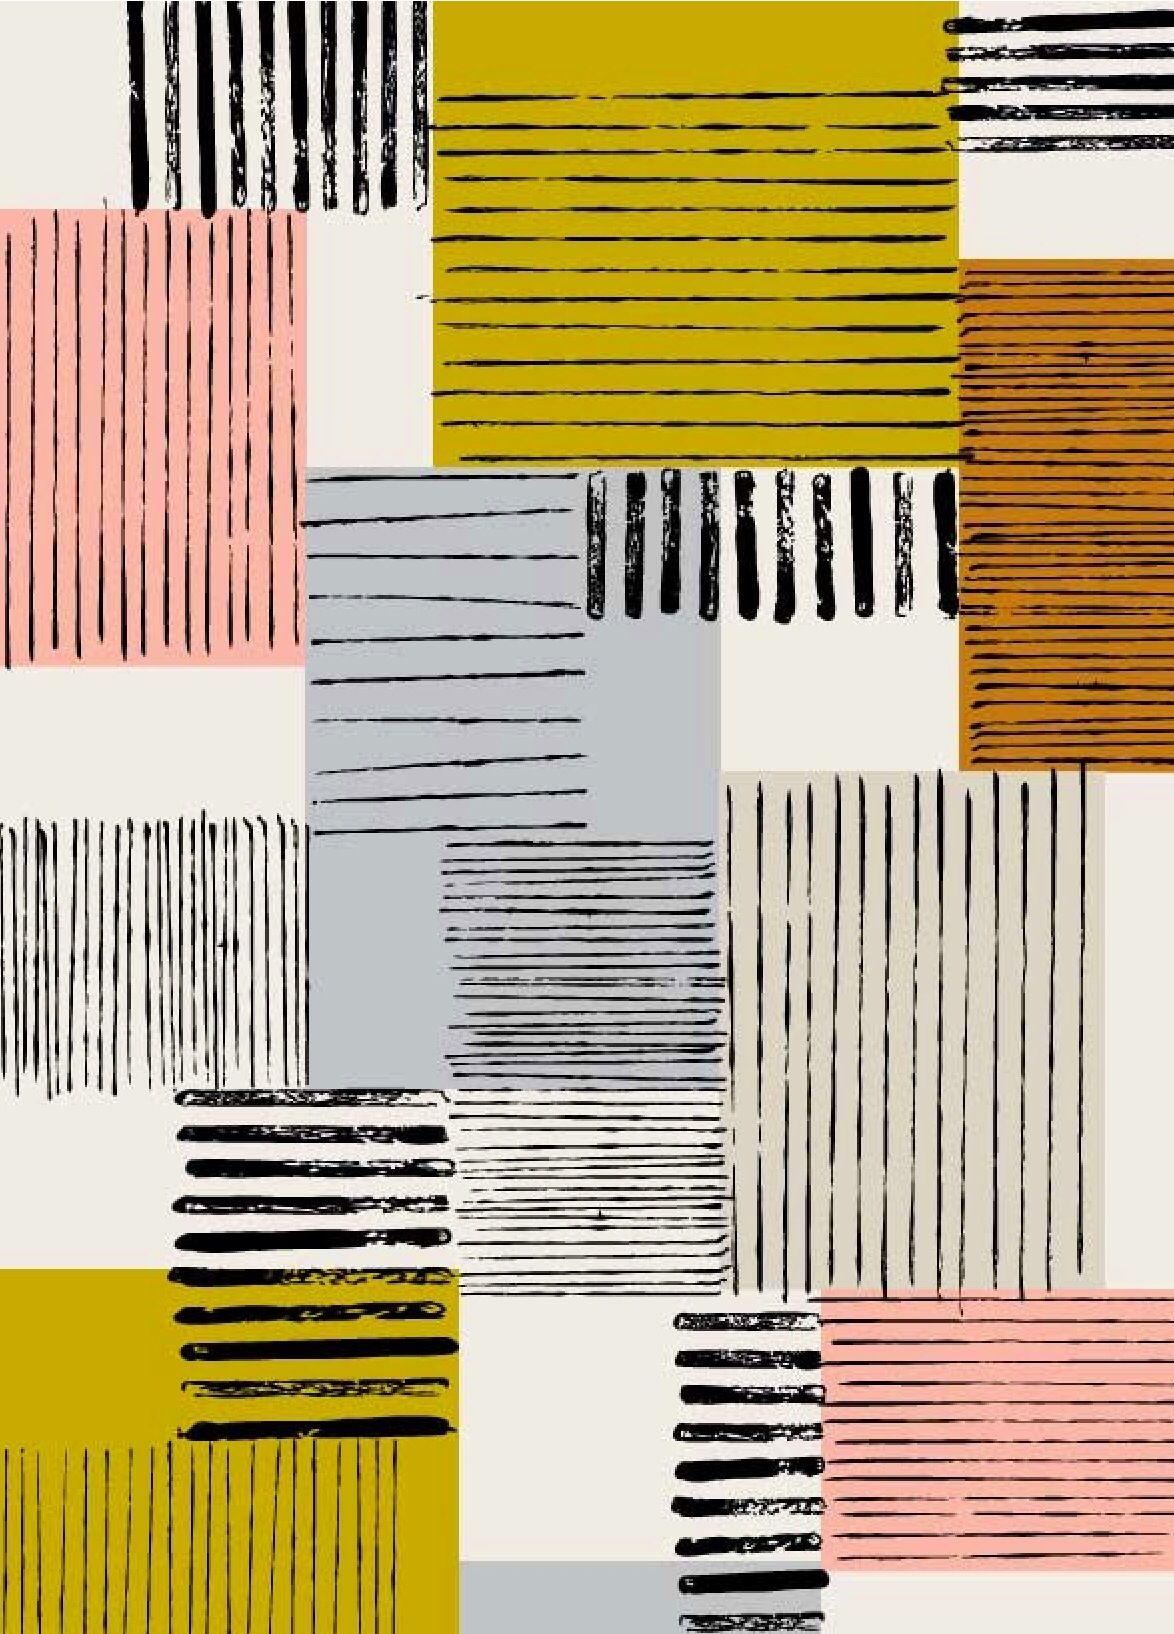 COLORS | Mynstur | Pinterest | Patterns, Prints and Mark making